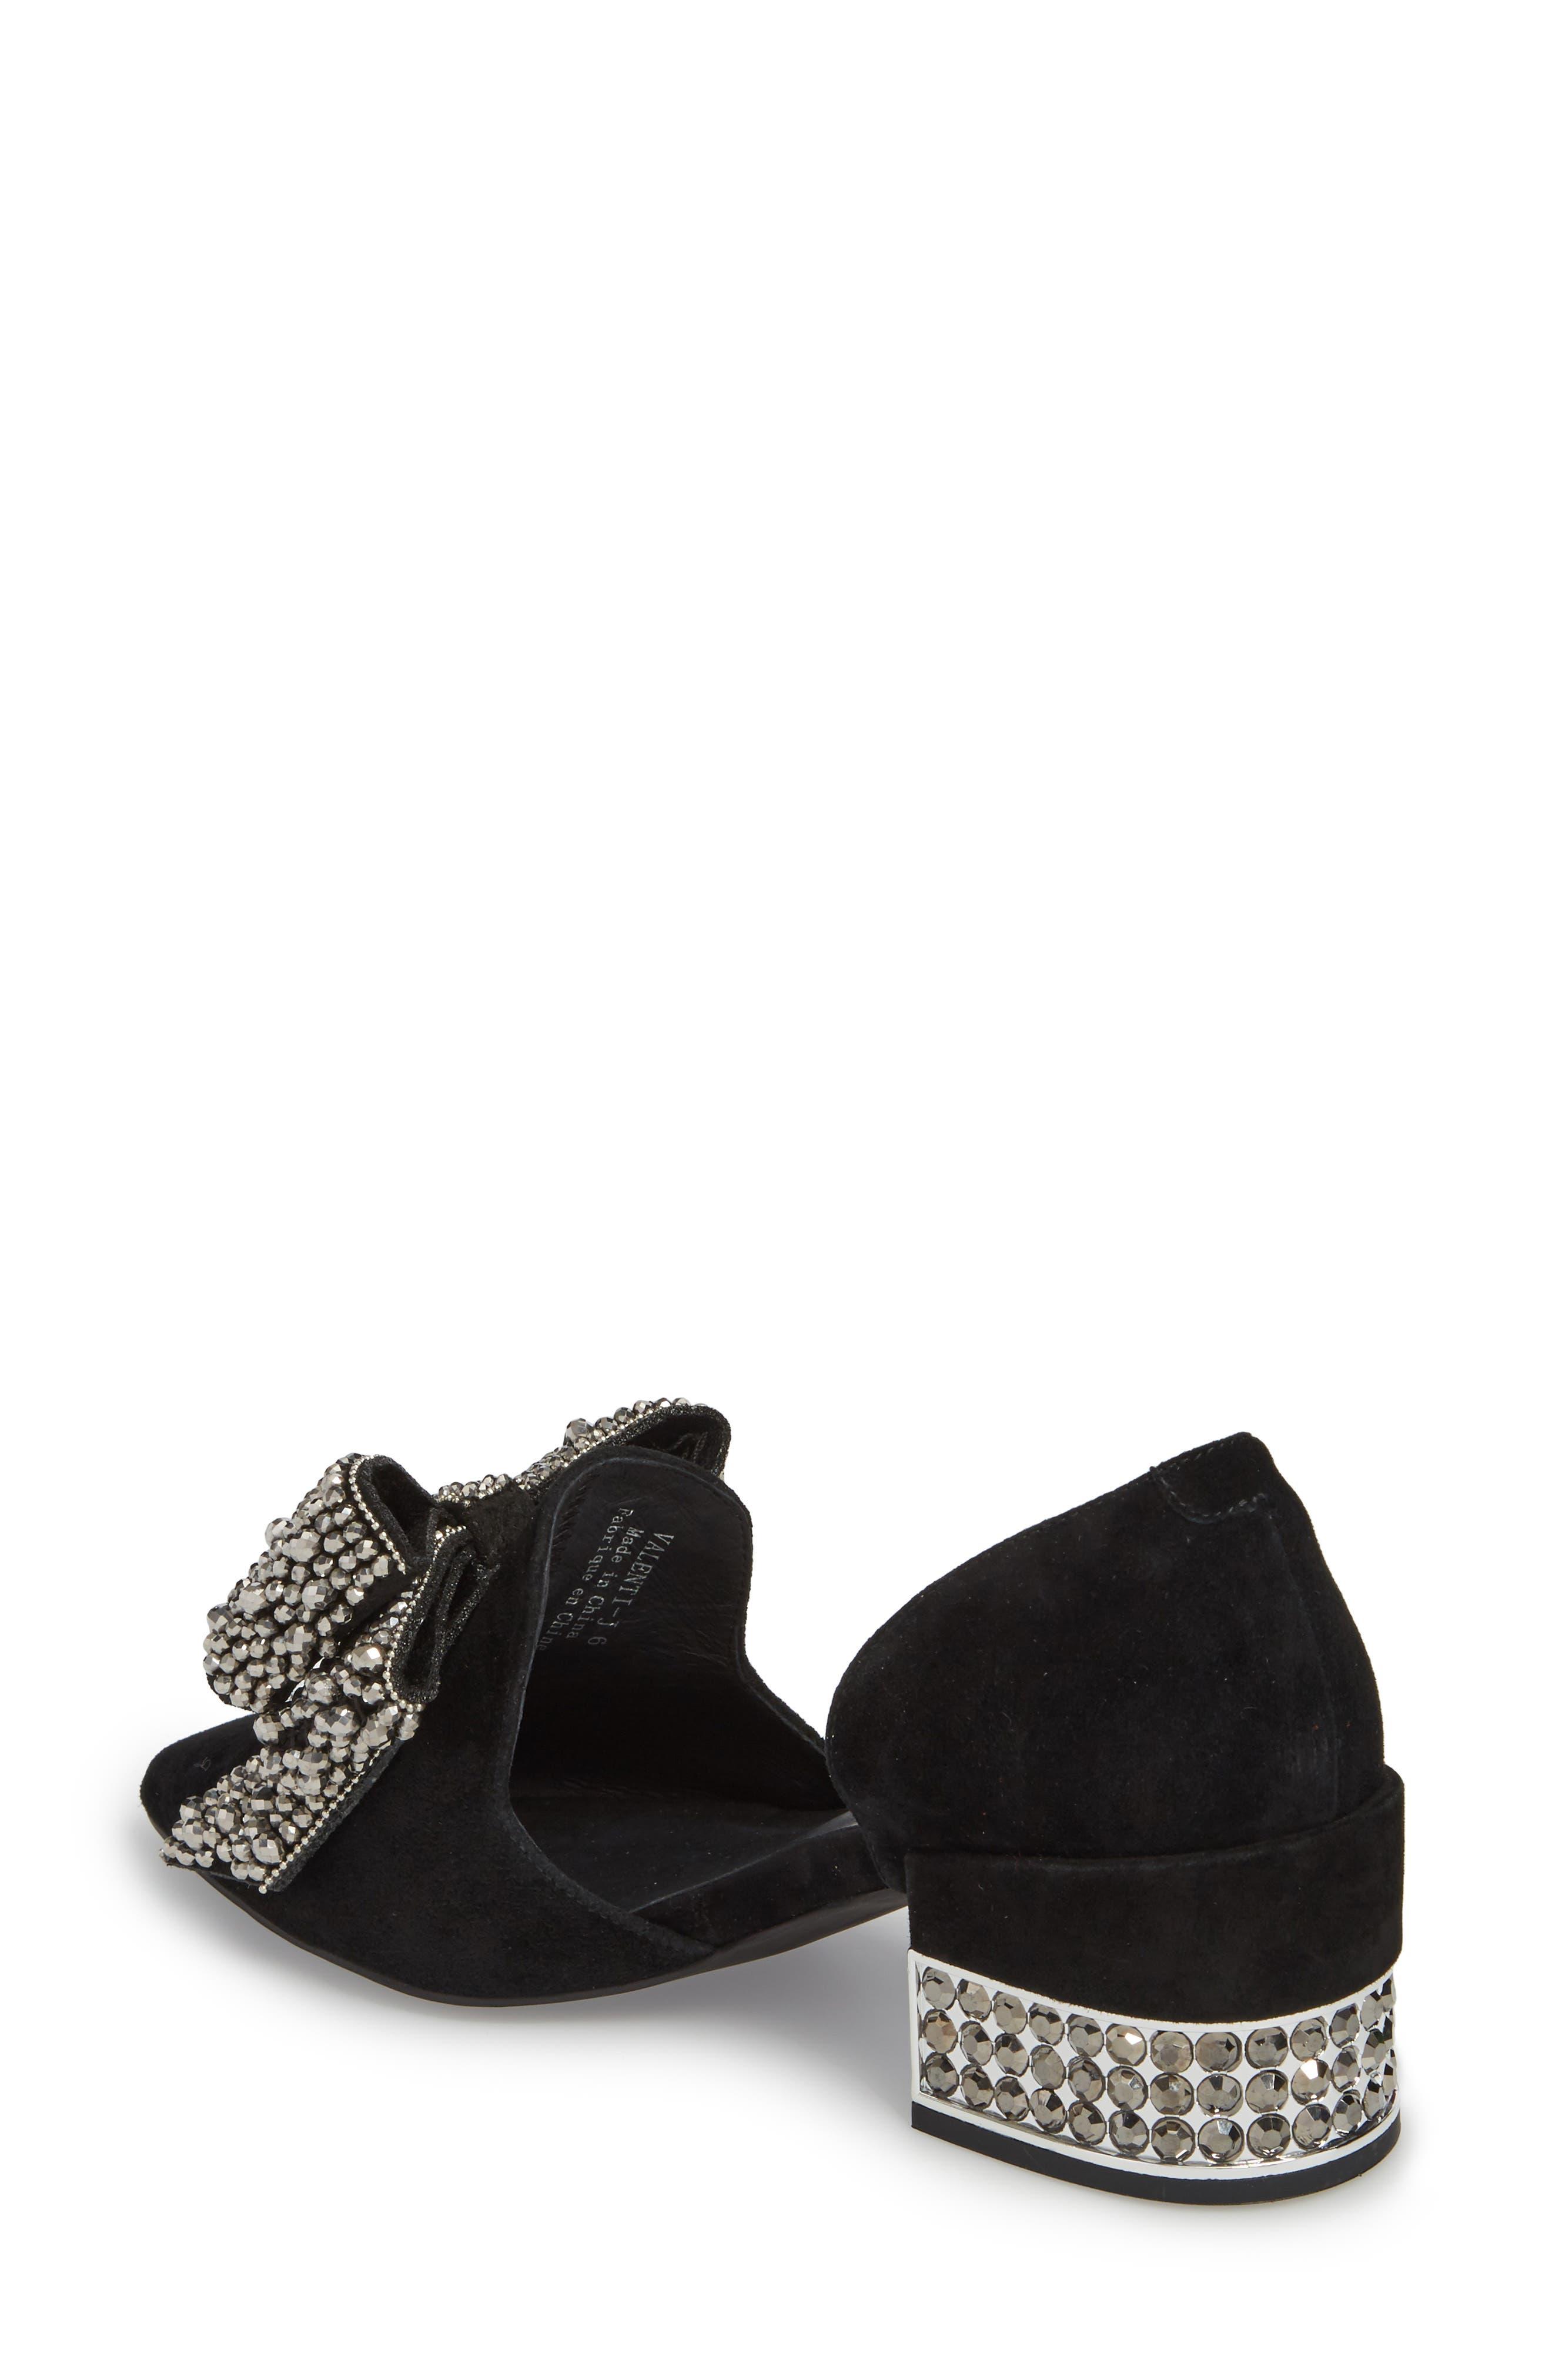 Alternate Image 2  - Jeffrey Campbell Valenti Embellished Bow Loafer (Women)